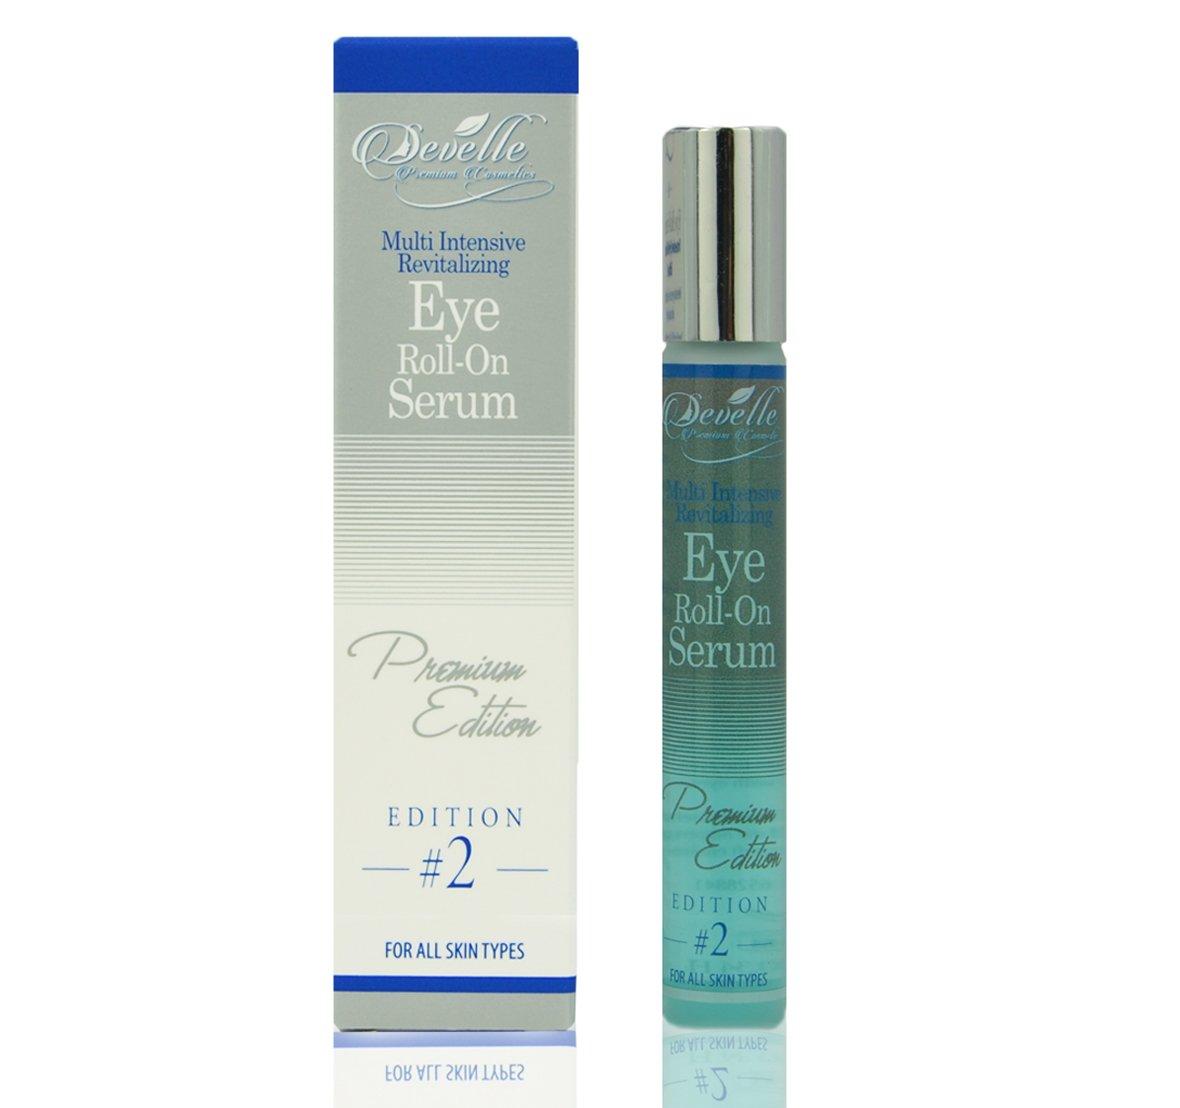 Develle Eye Roll-On   10 ml bottle   Eye lotion   Eye serum  BLUE Premium Edition   Anti wrinkle eye serum